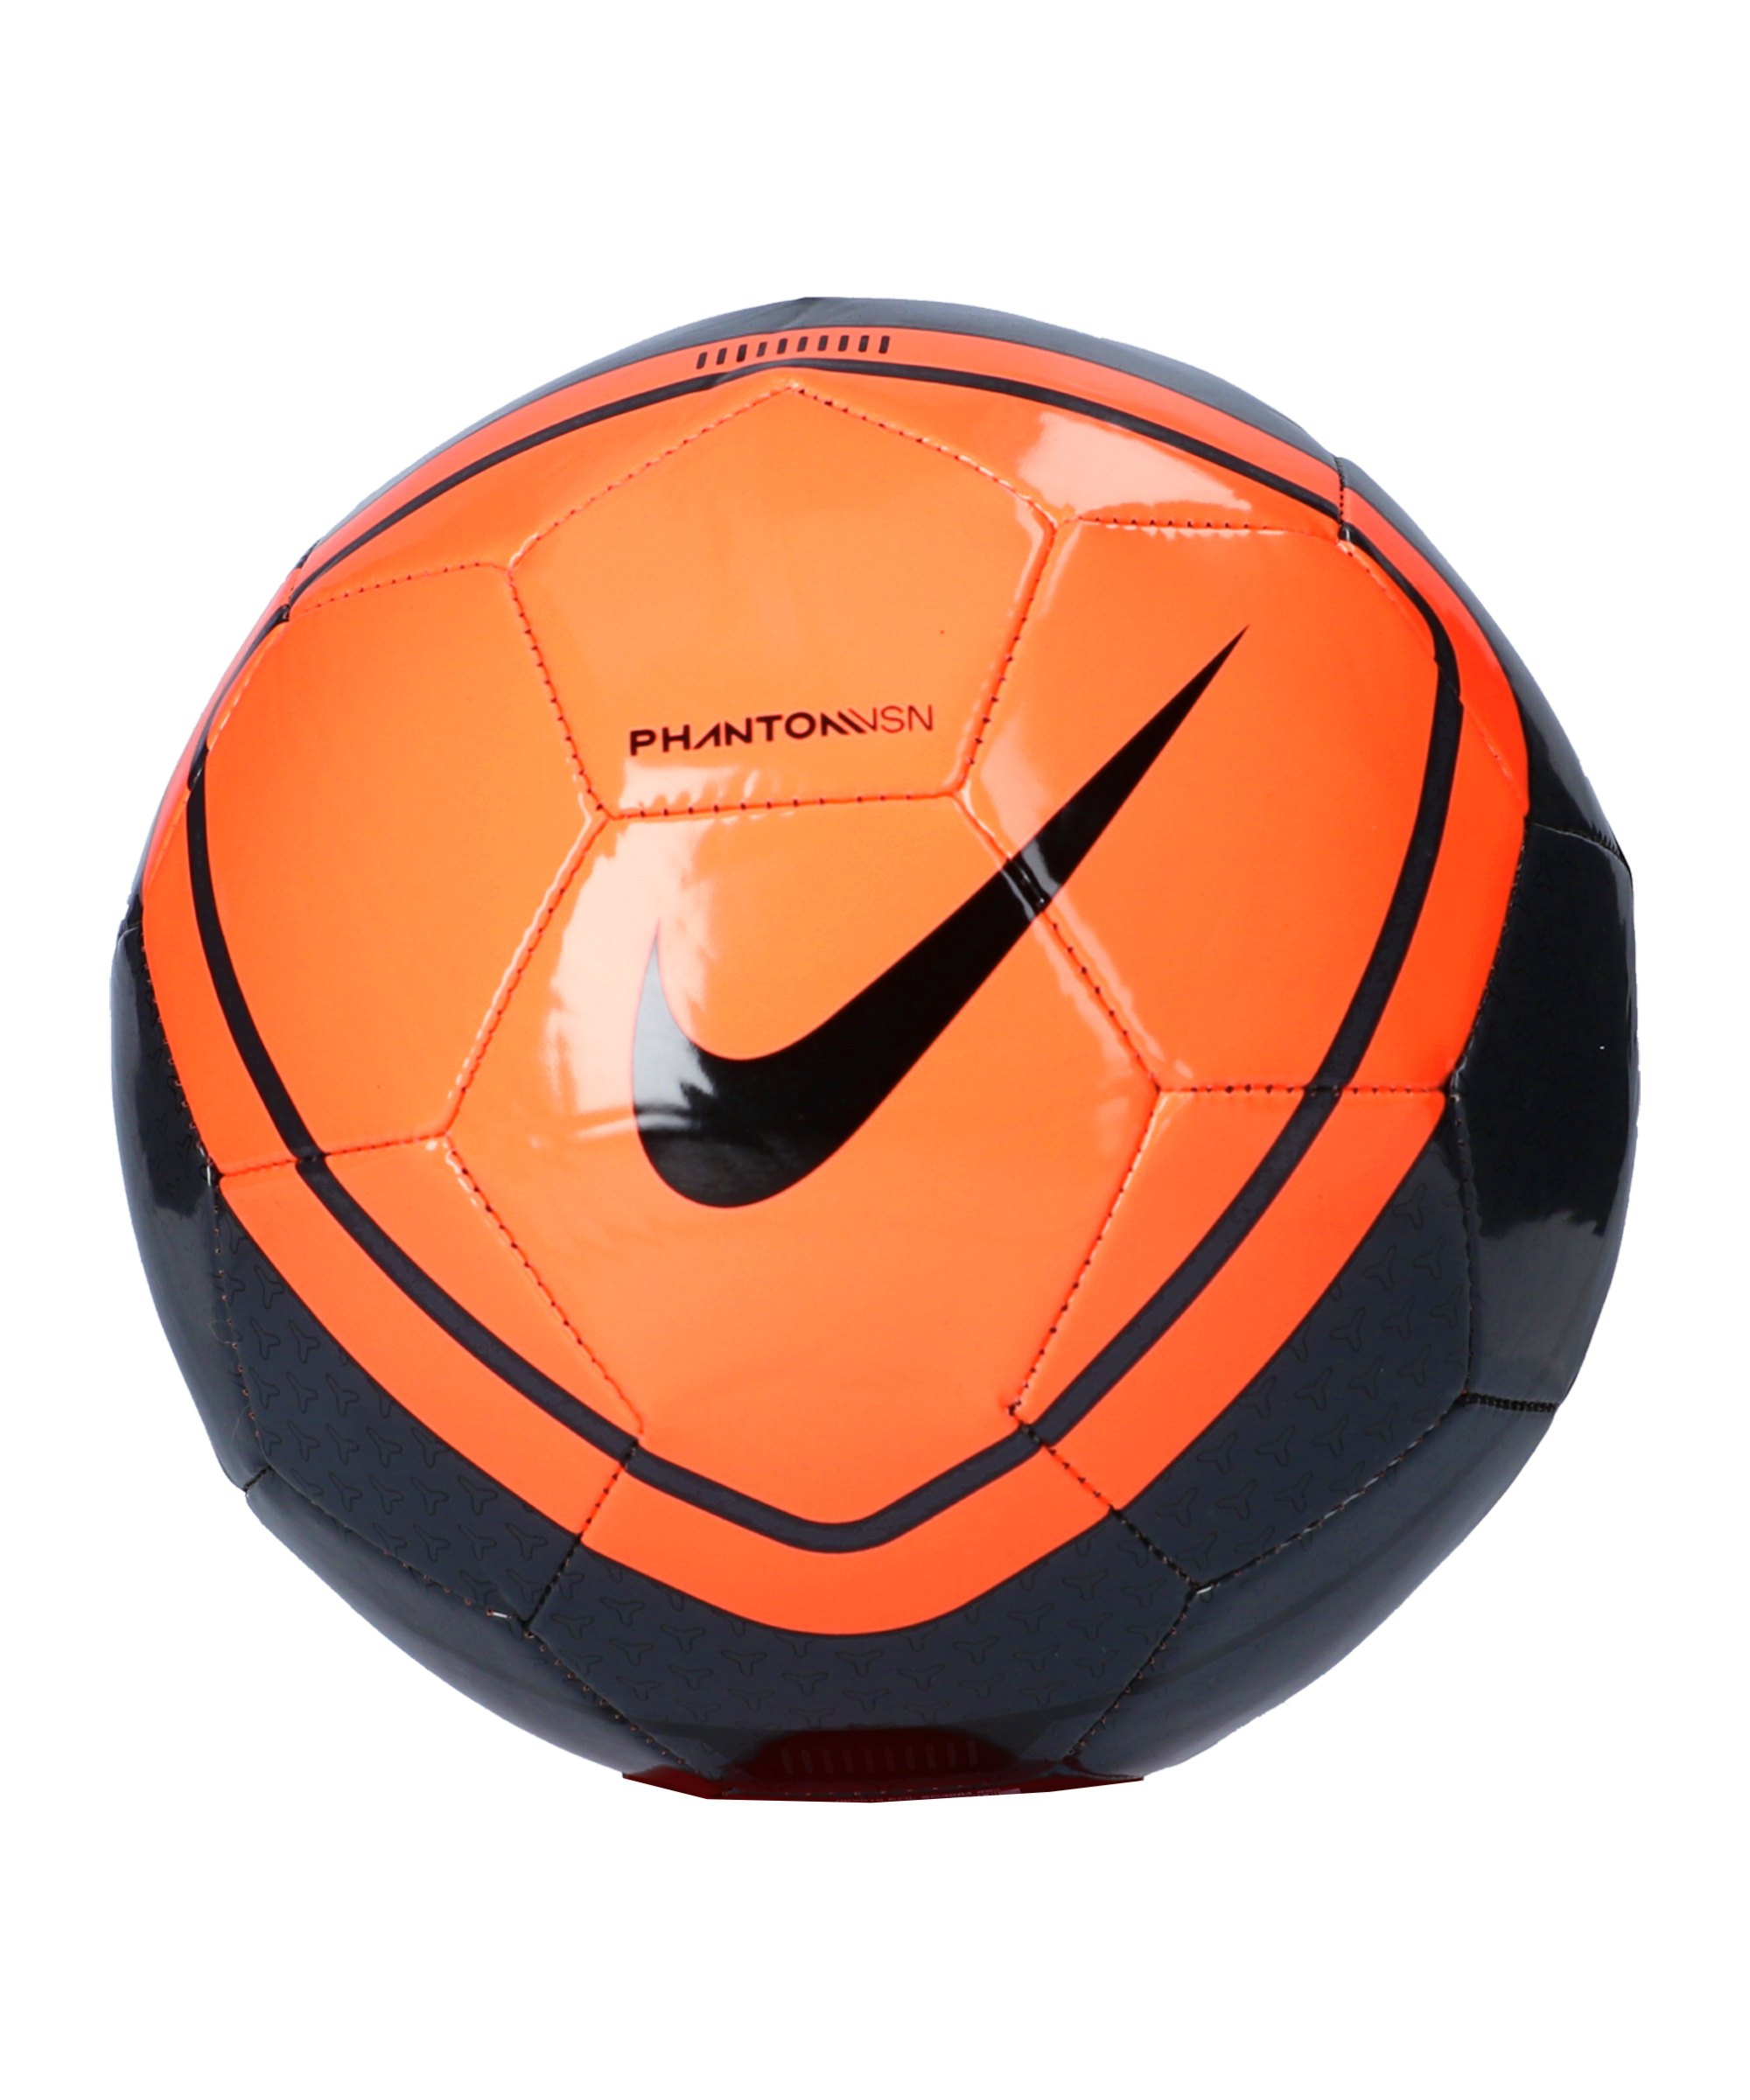 Nike Phantom Vision Fussball Orange F892 - orange